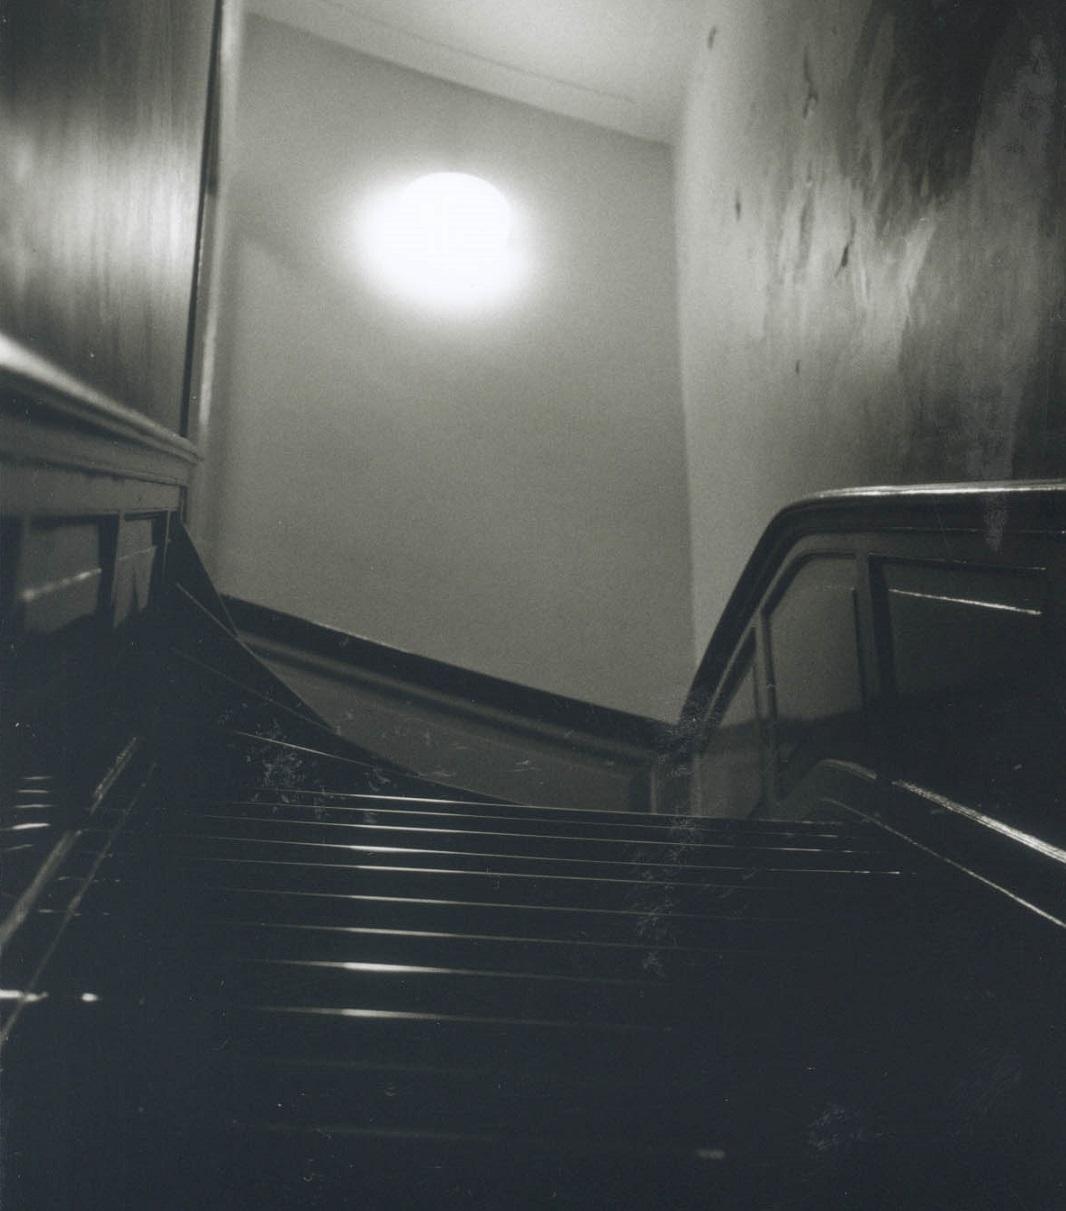 Stairway at Utrecht University Library (photo by Andrea Hajek)